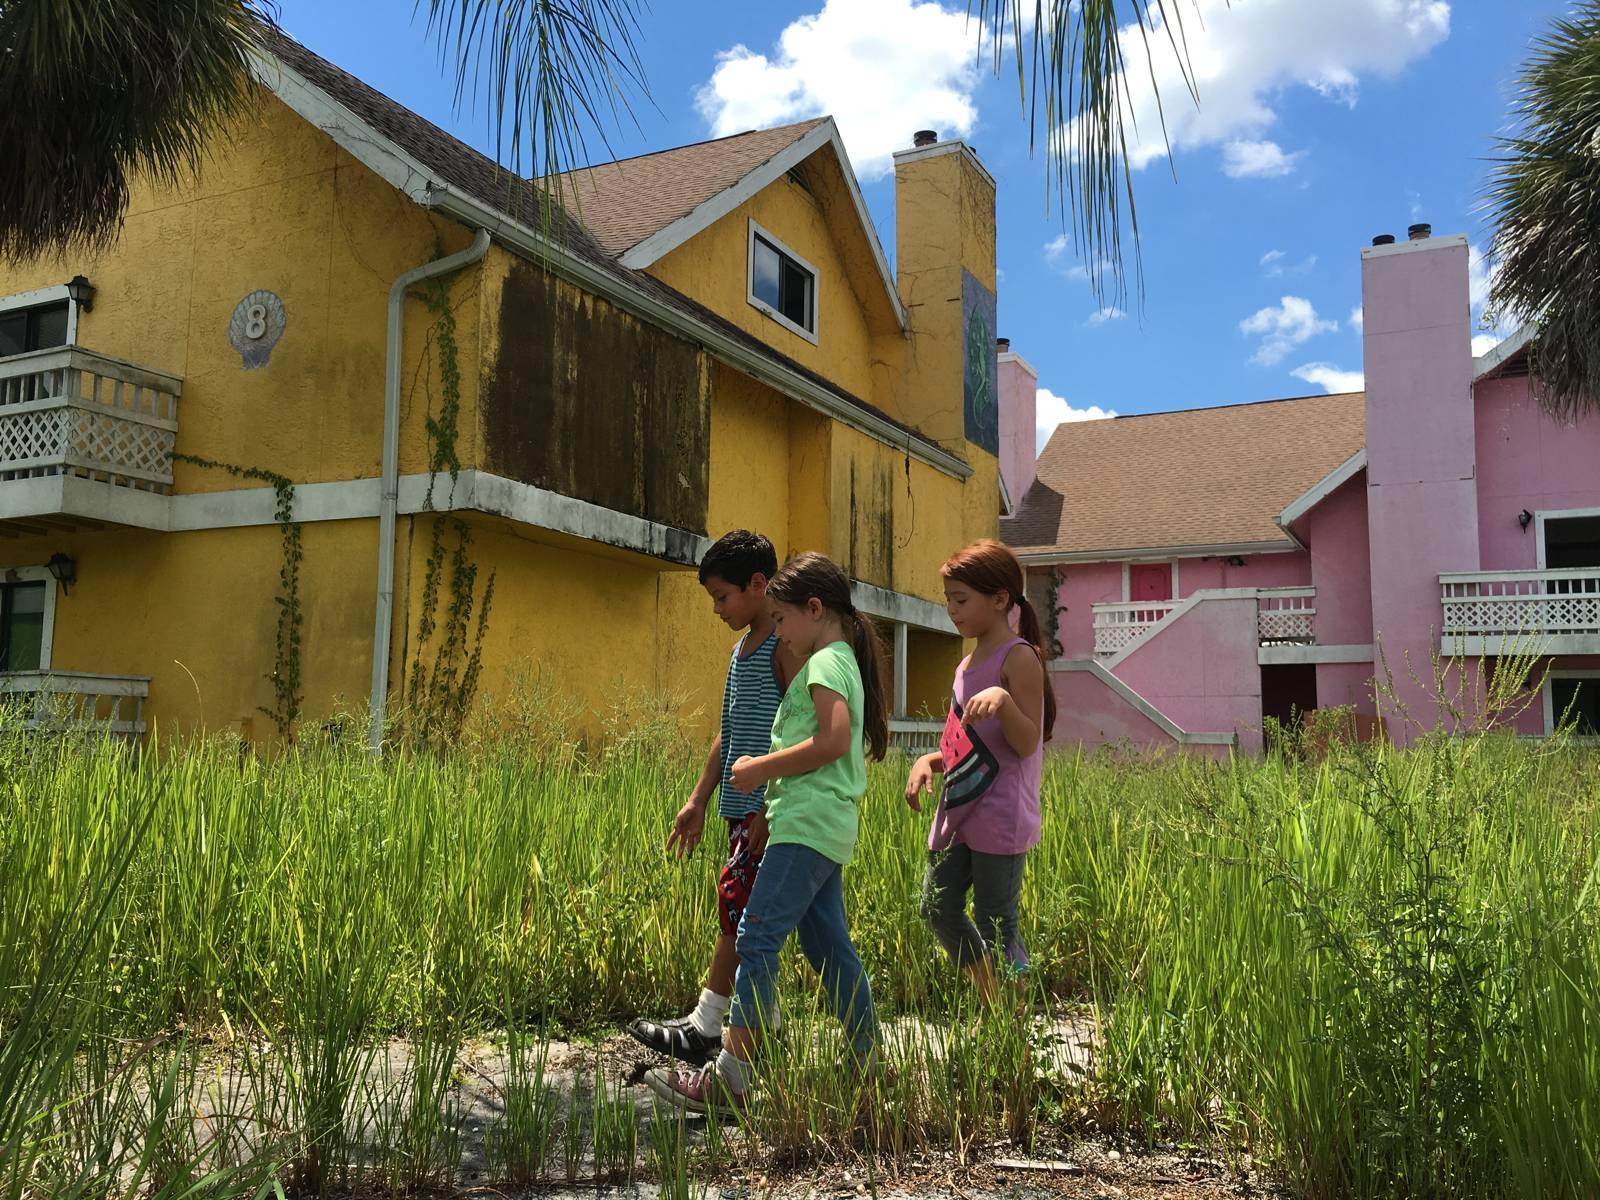 「the florida project」的圖片搜尋結果